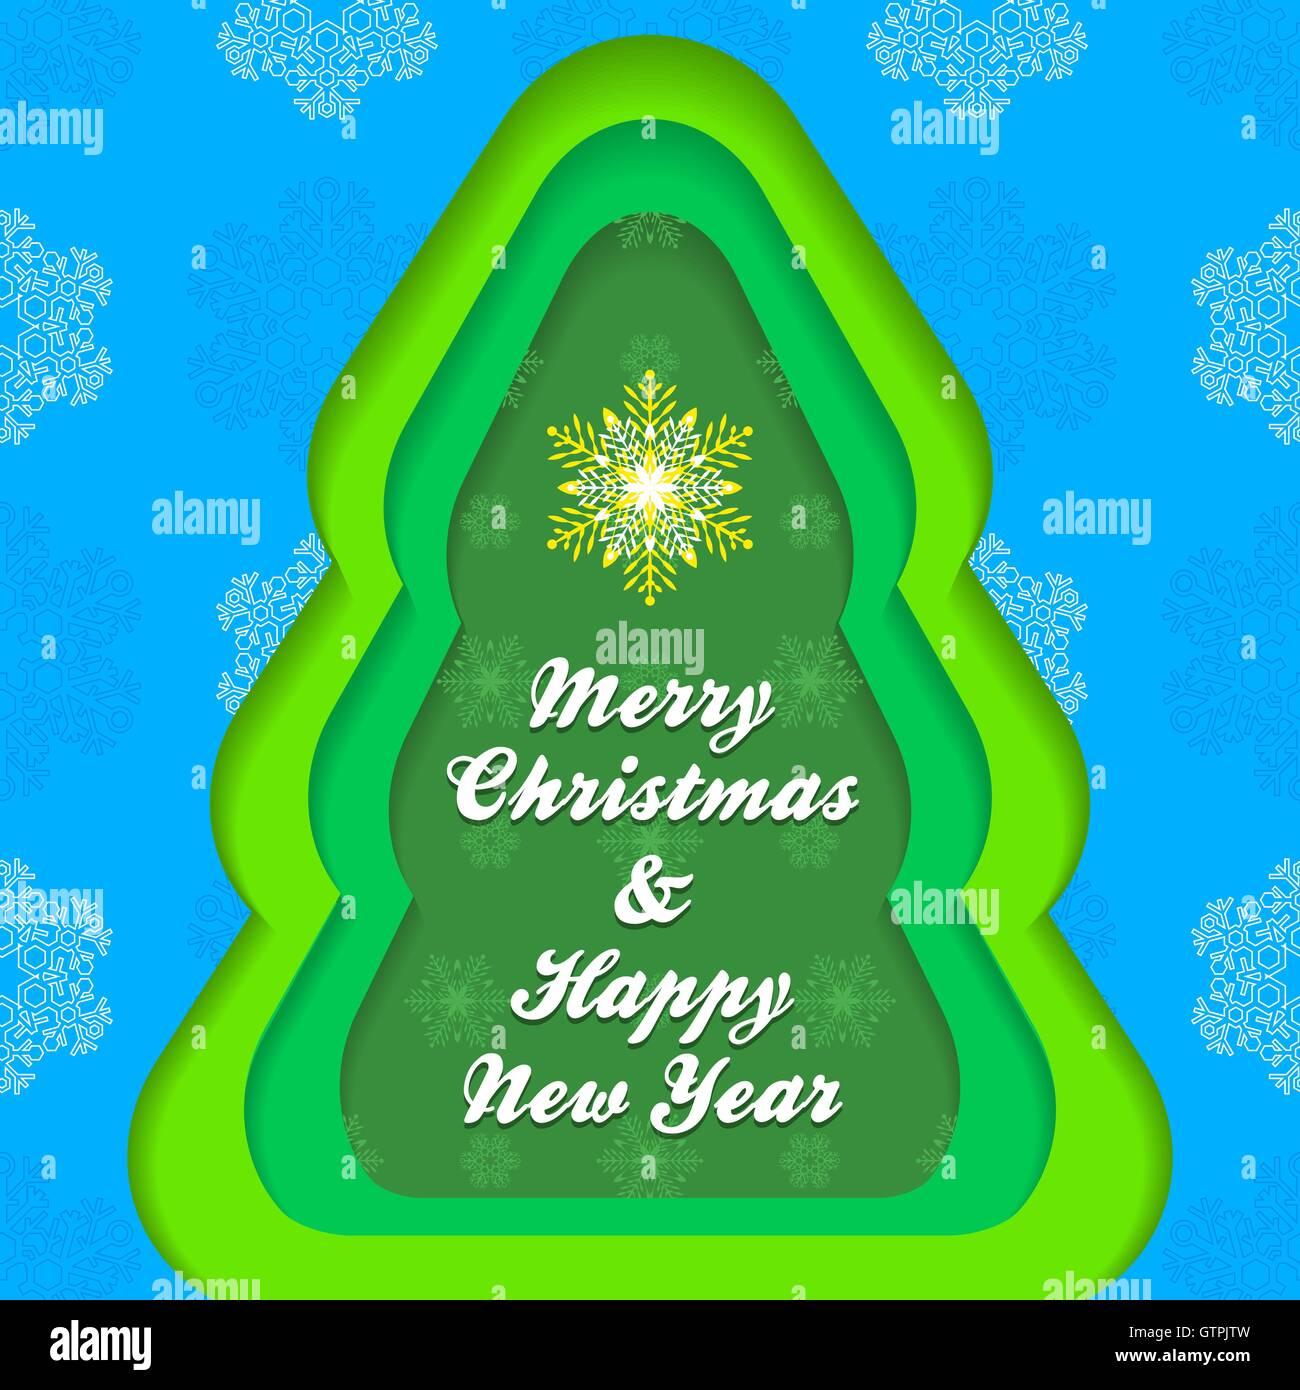 Vector Blue Green Colours Minimal Design Christmas Tree Shape New